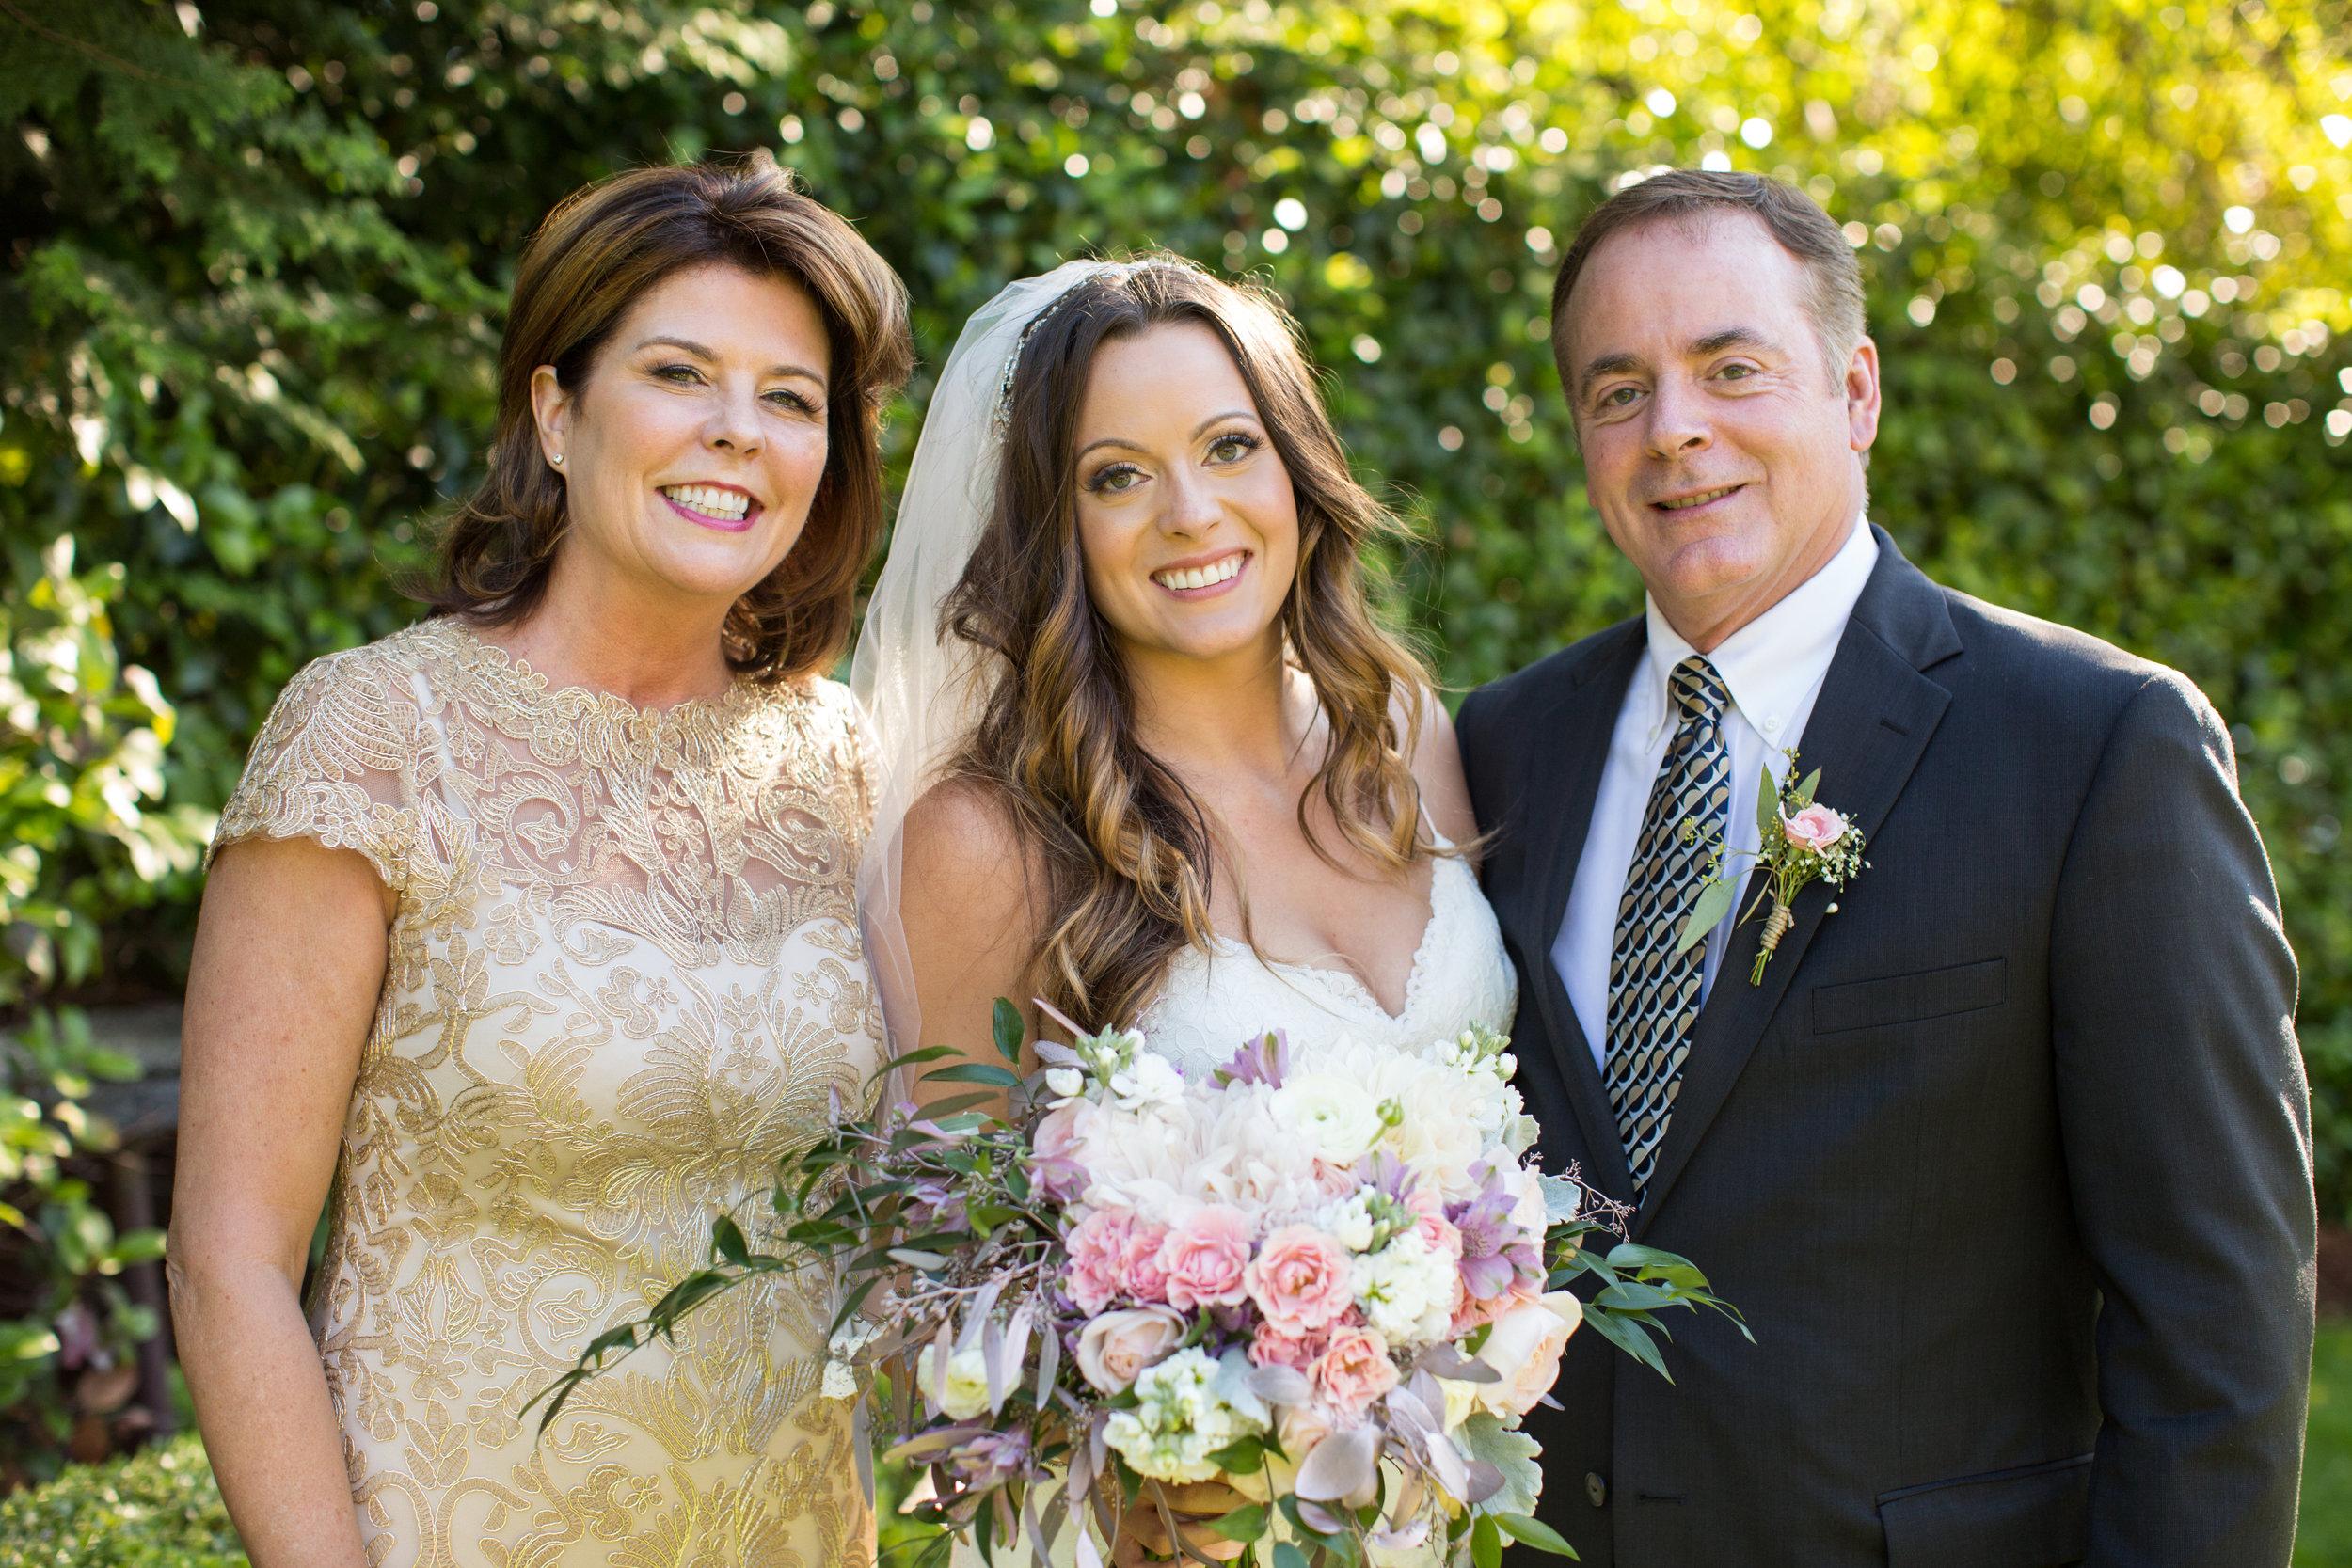 sandstrom_wedding_282.jpg